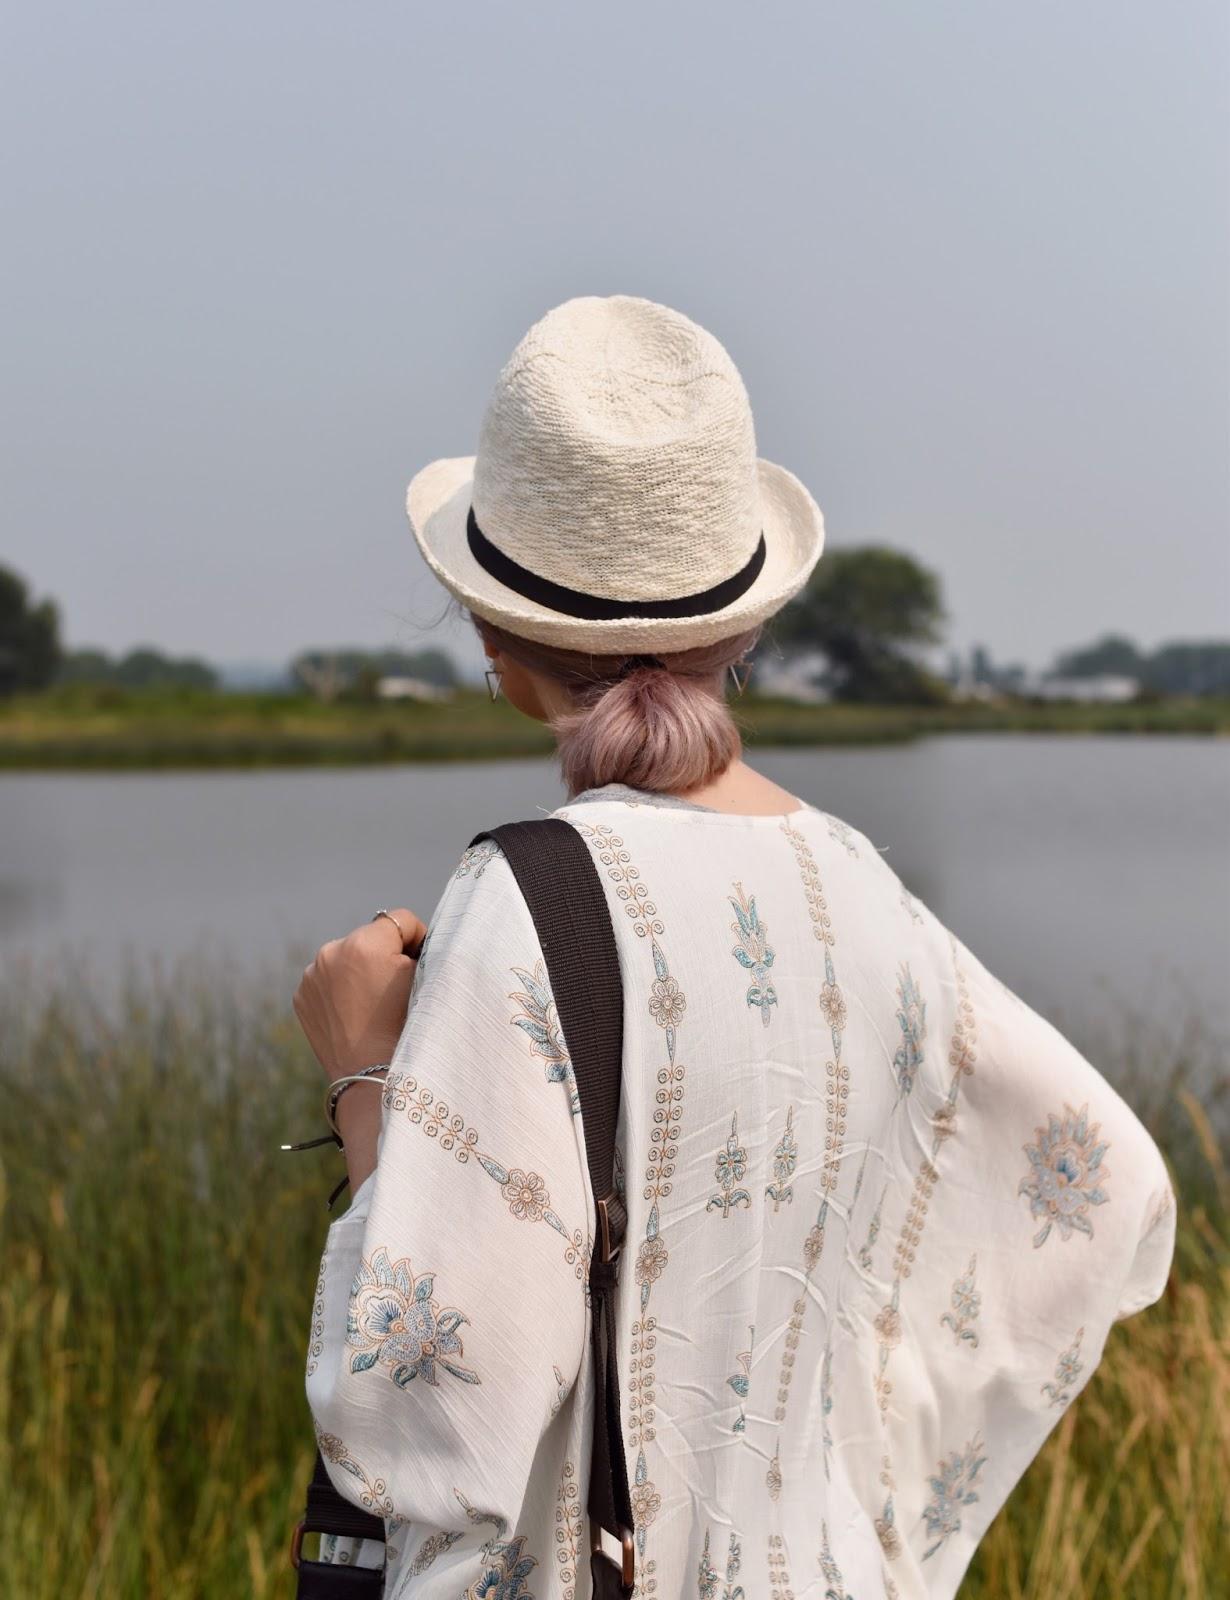 Monika Faulkner personal style inspiration - damask-patterned kimono, straw fedora